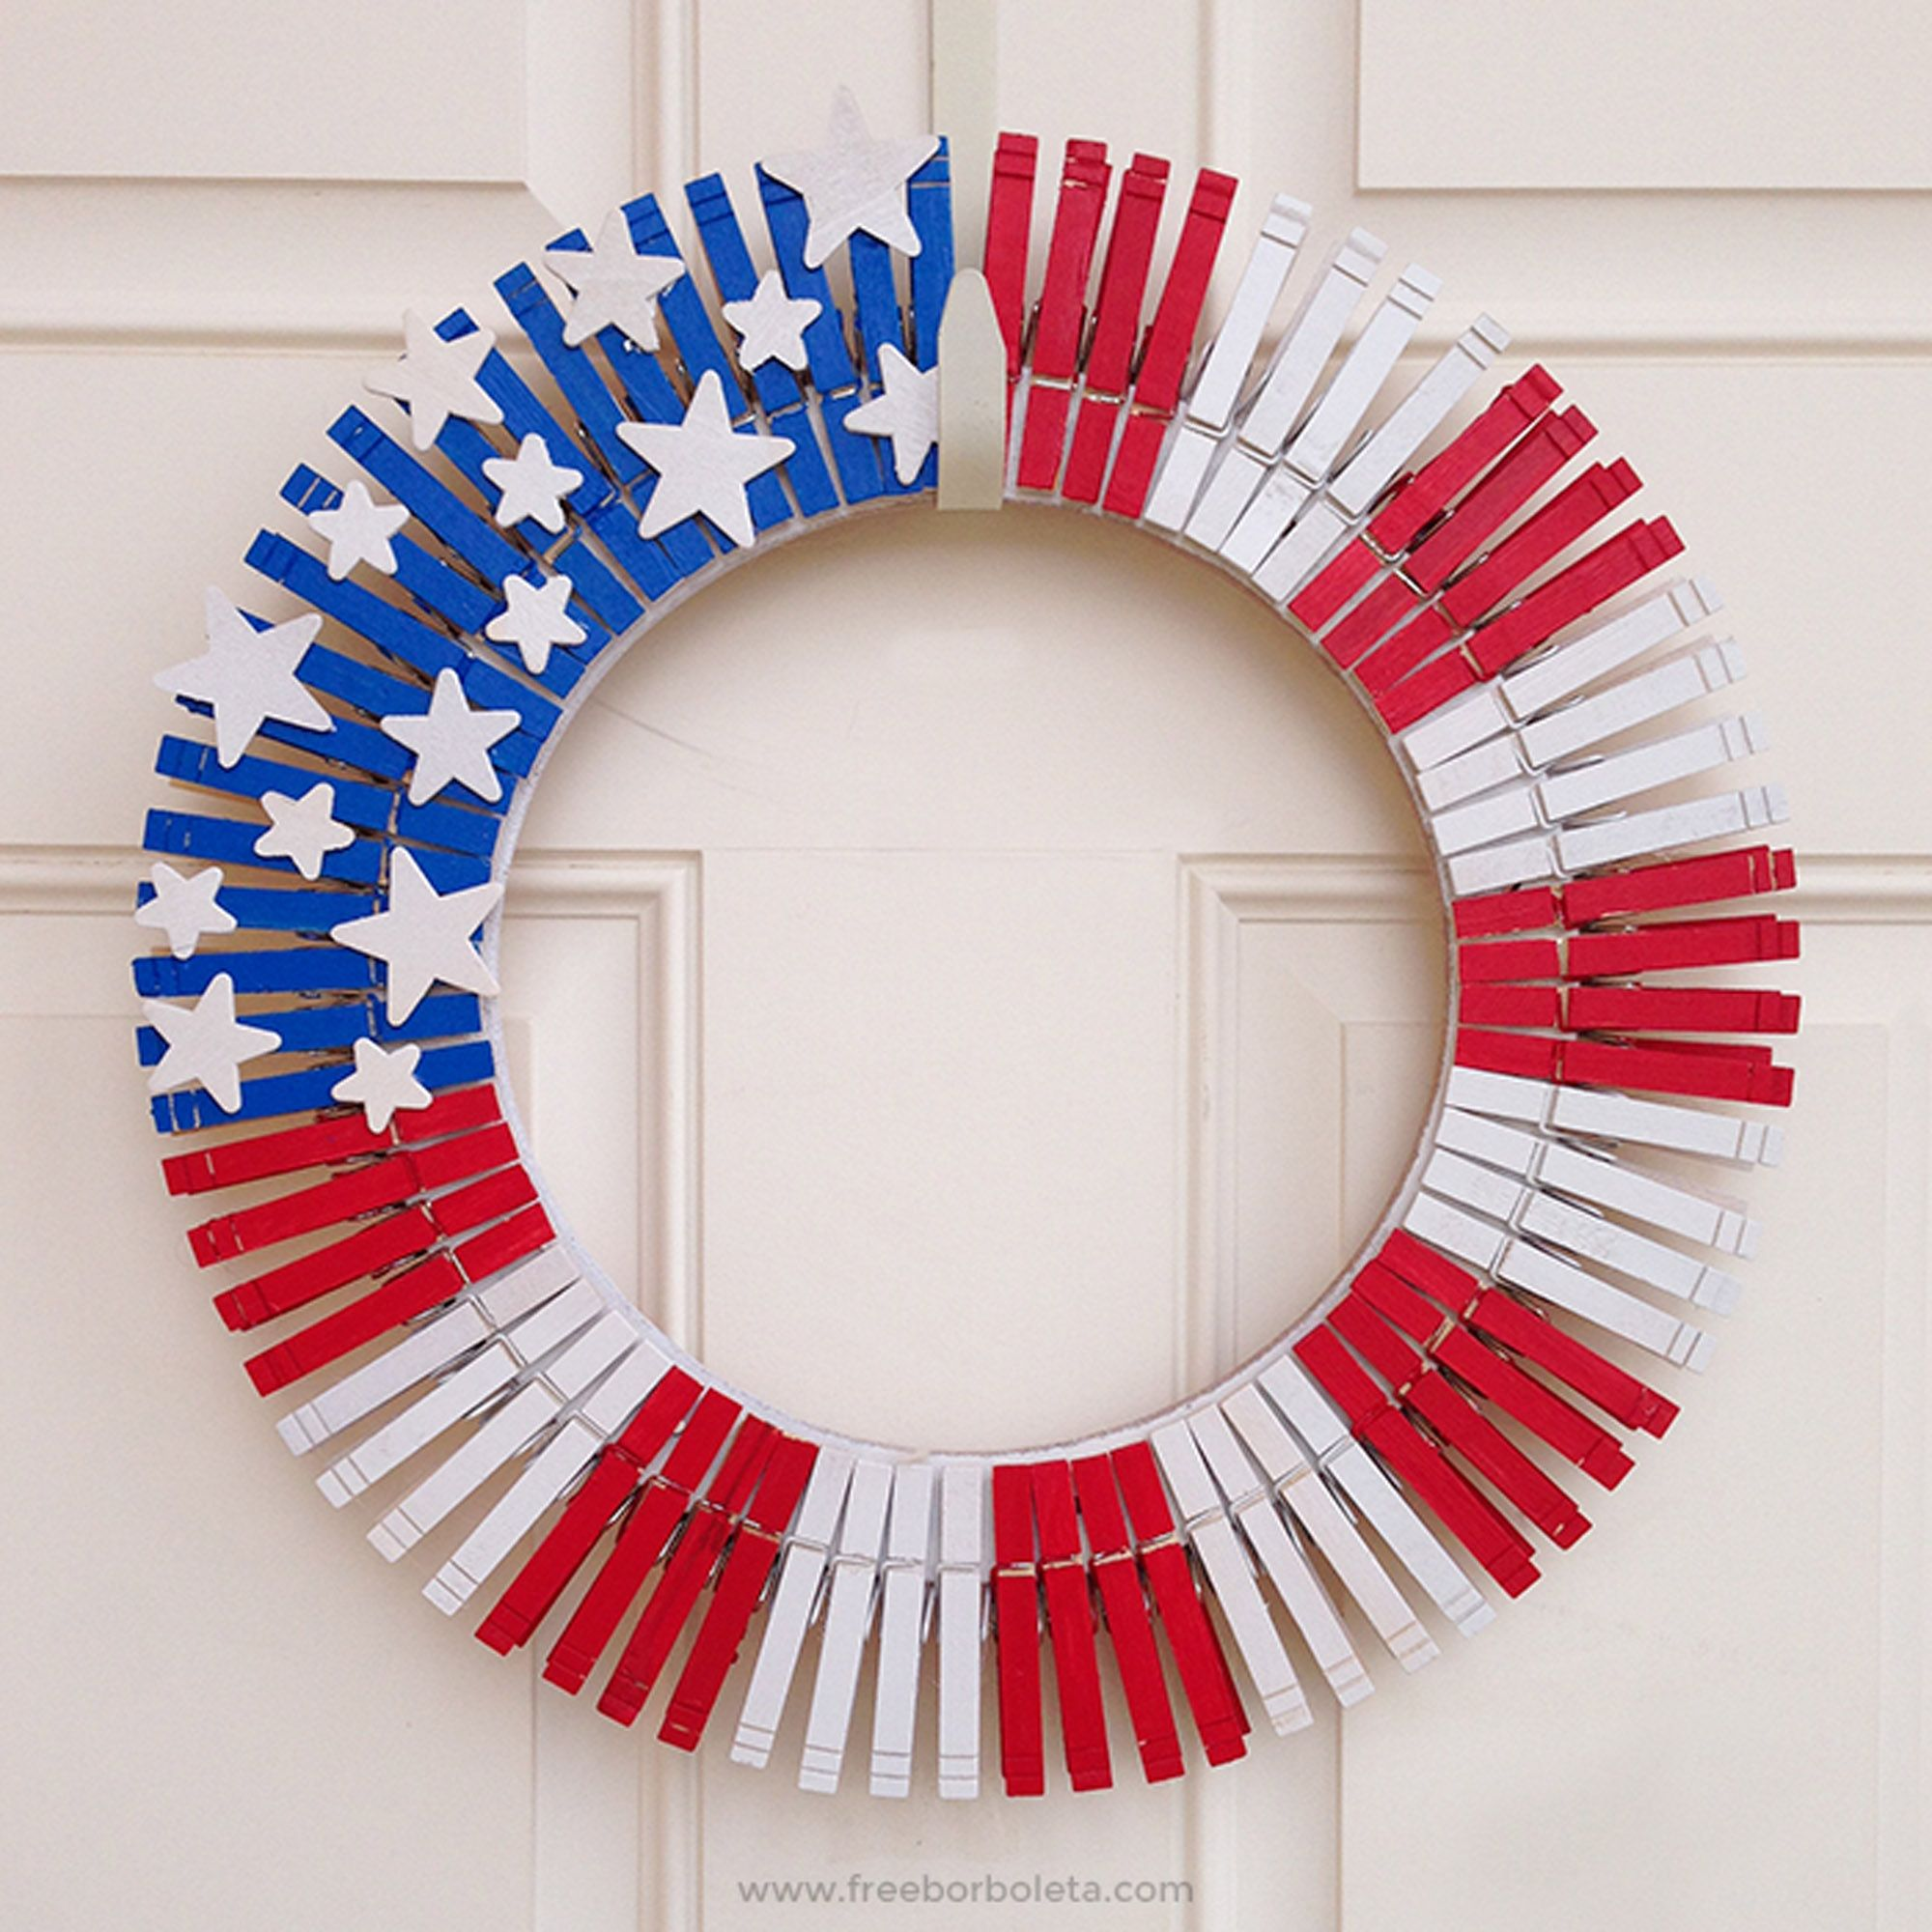 26 easy 4th of july crafts - patriotic craft ideas & diy decorations